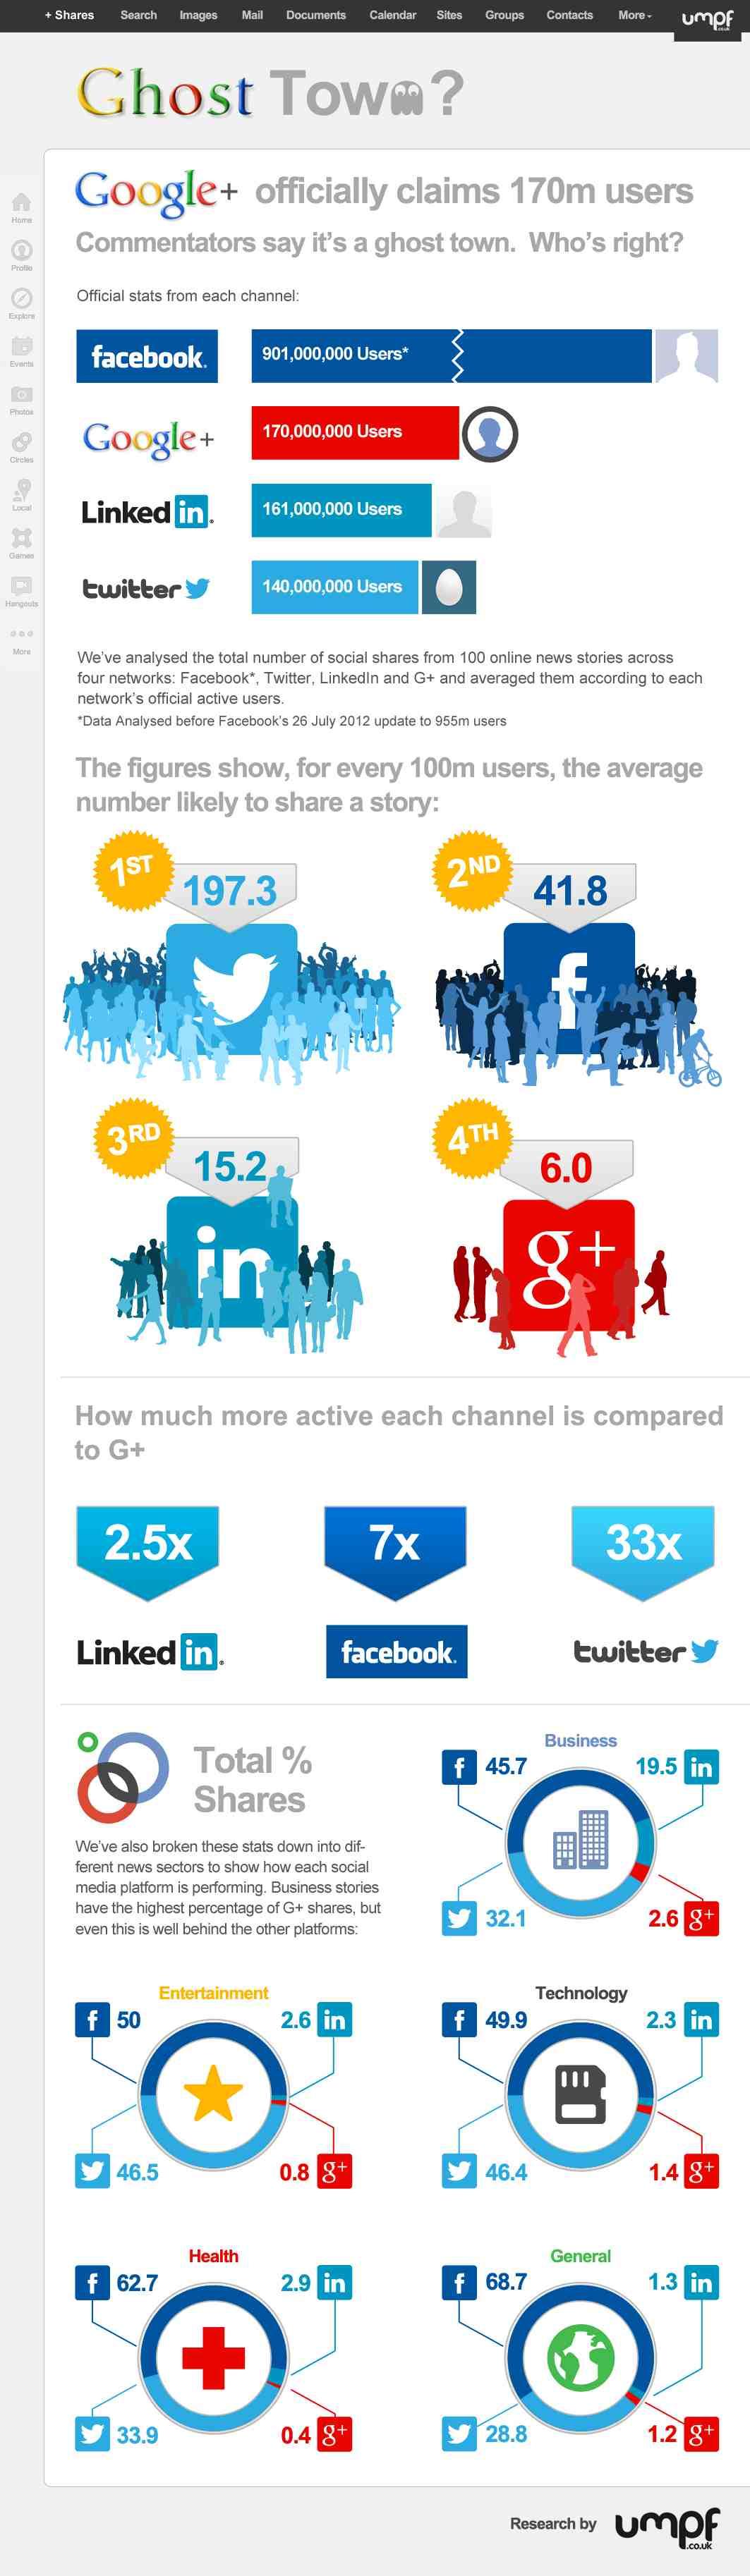 Google-Plus-Ghost-Town-Social-Shares-versus-Twitter-LinkedIn-Facebook-Umpf